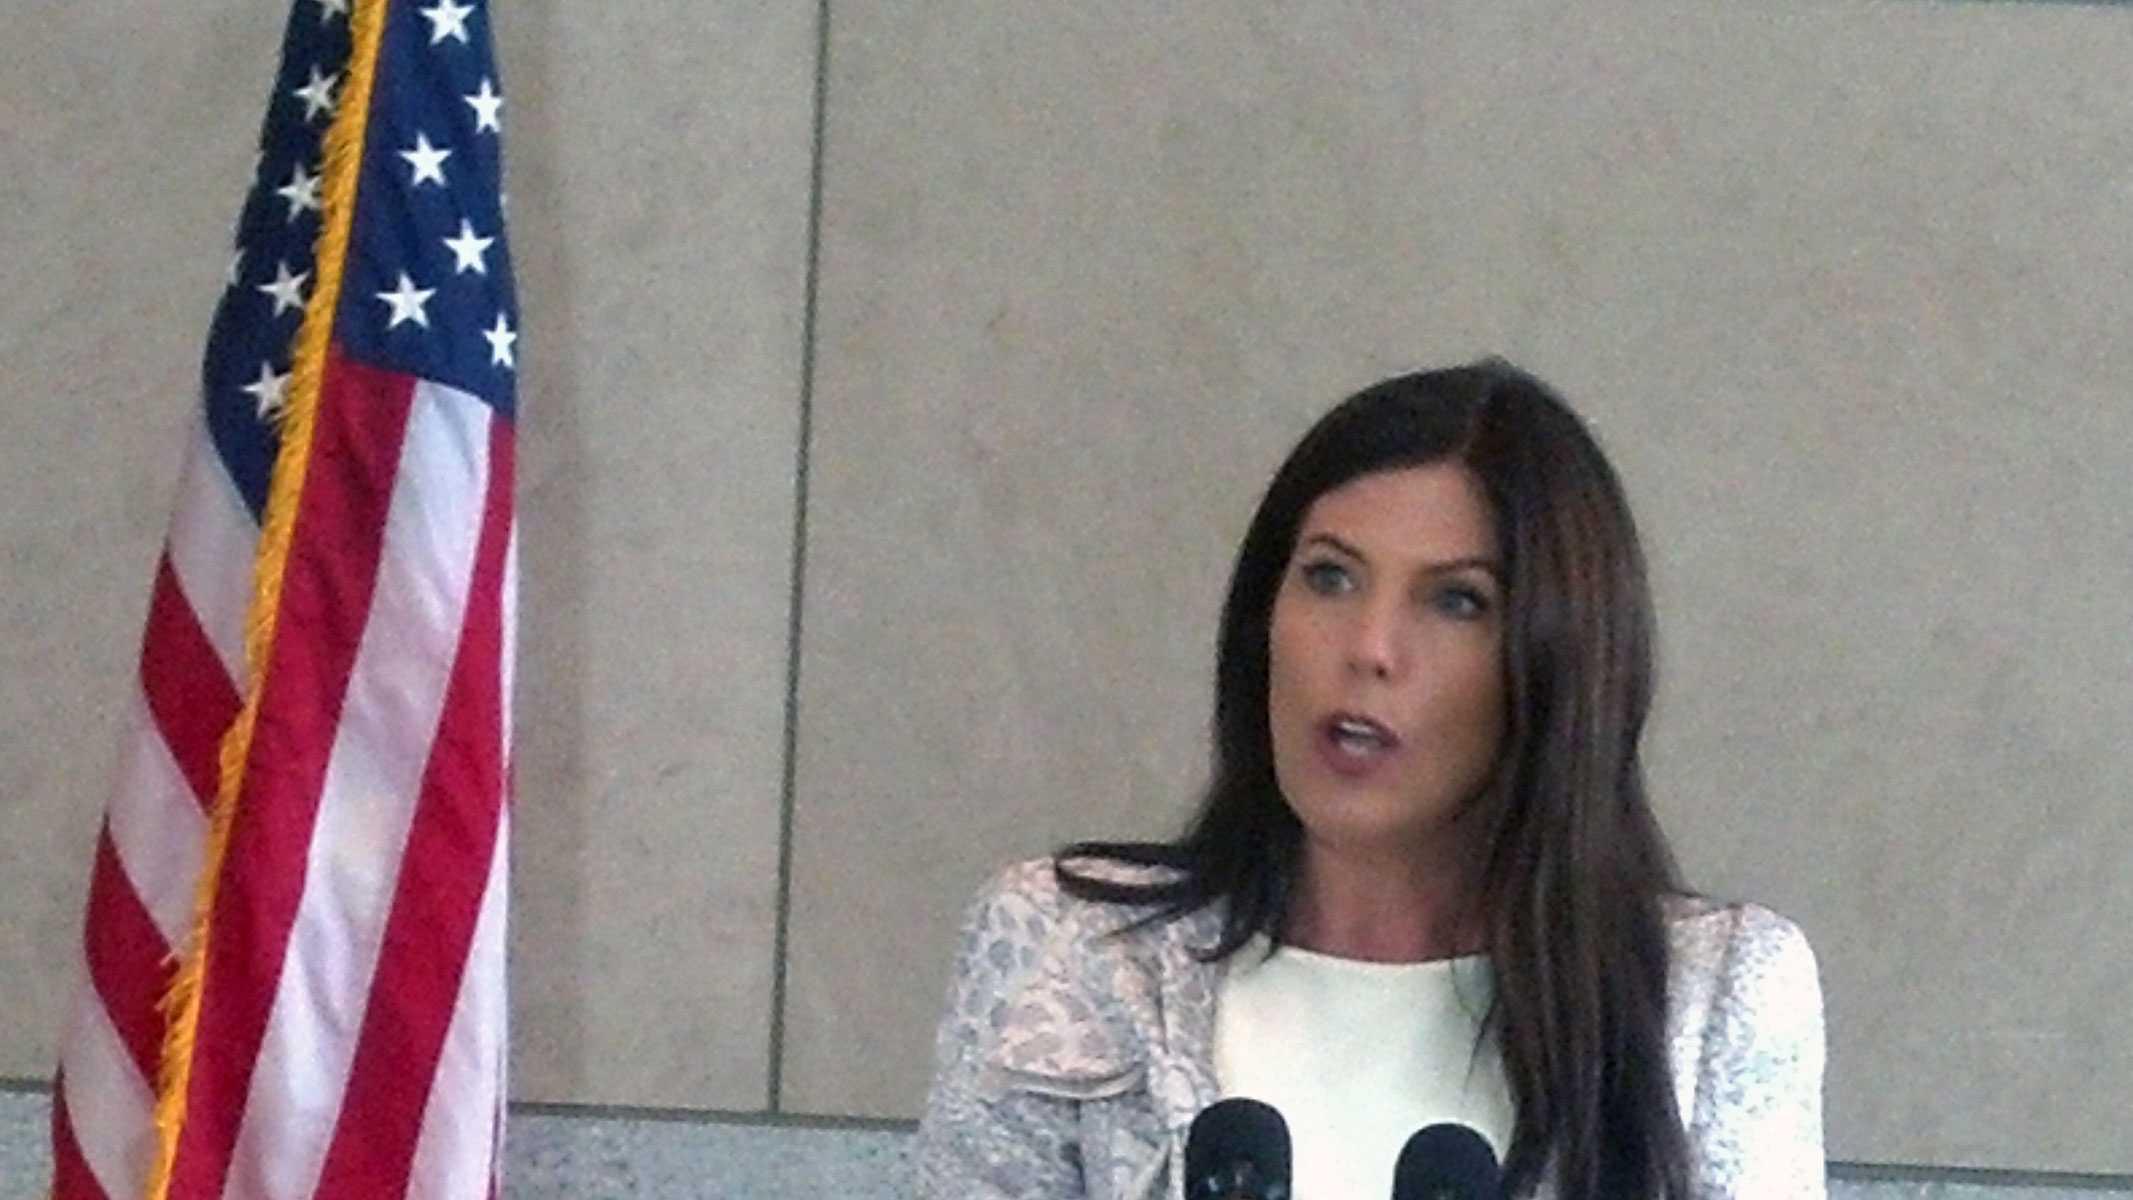 Pennsylvania Attorney General Kathleen Kane